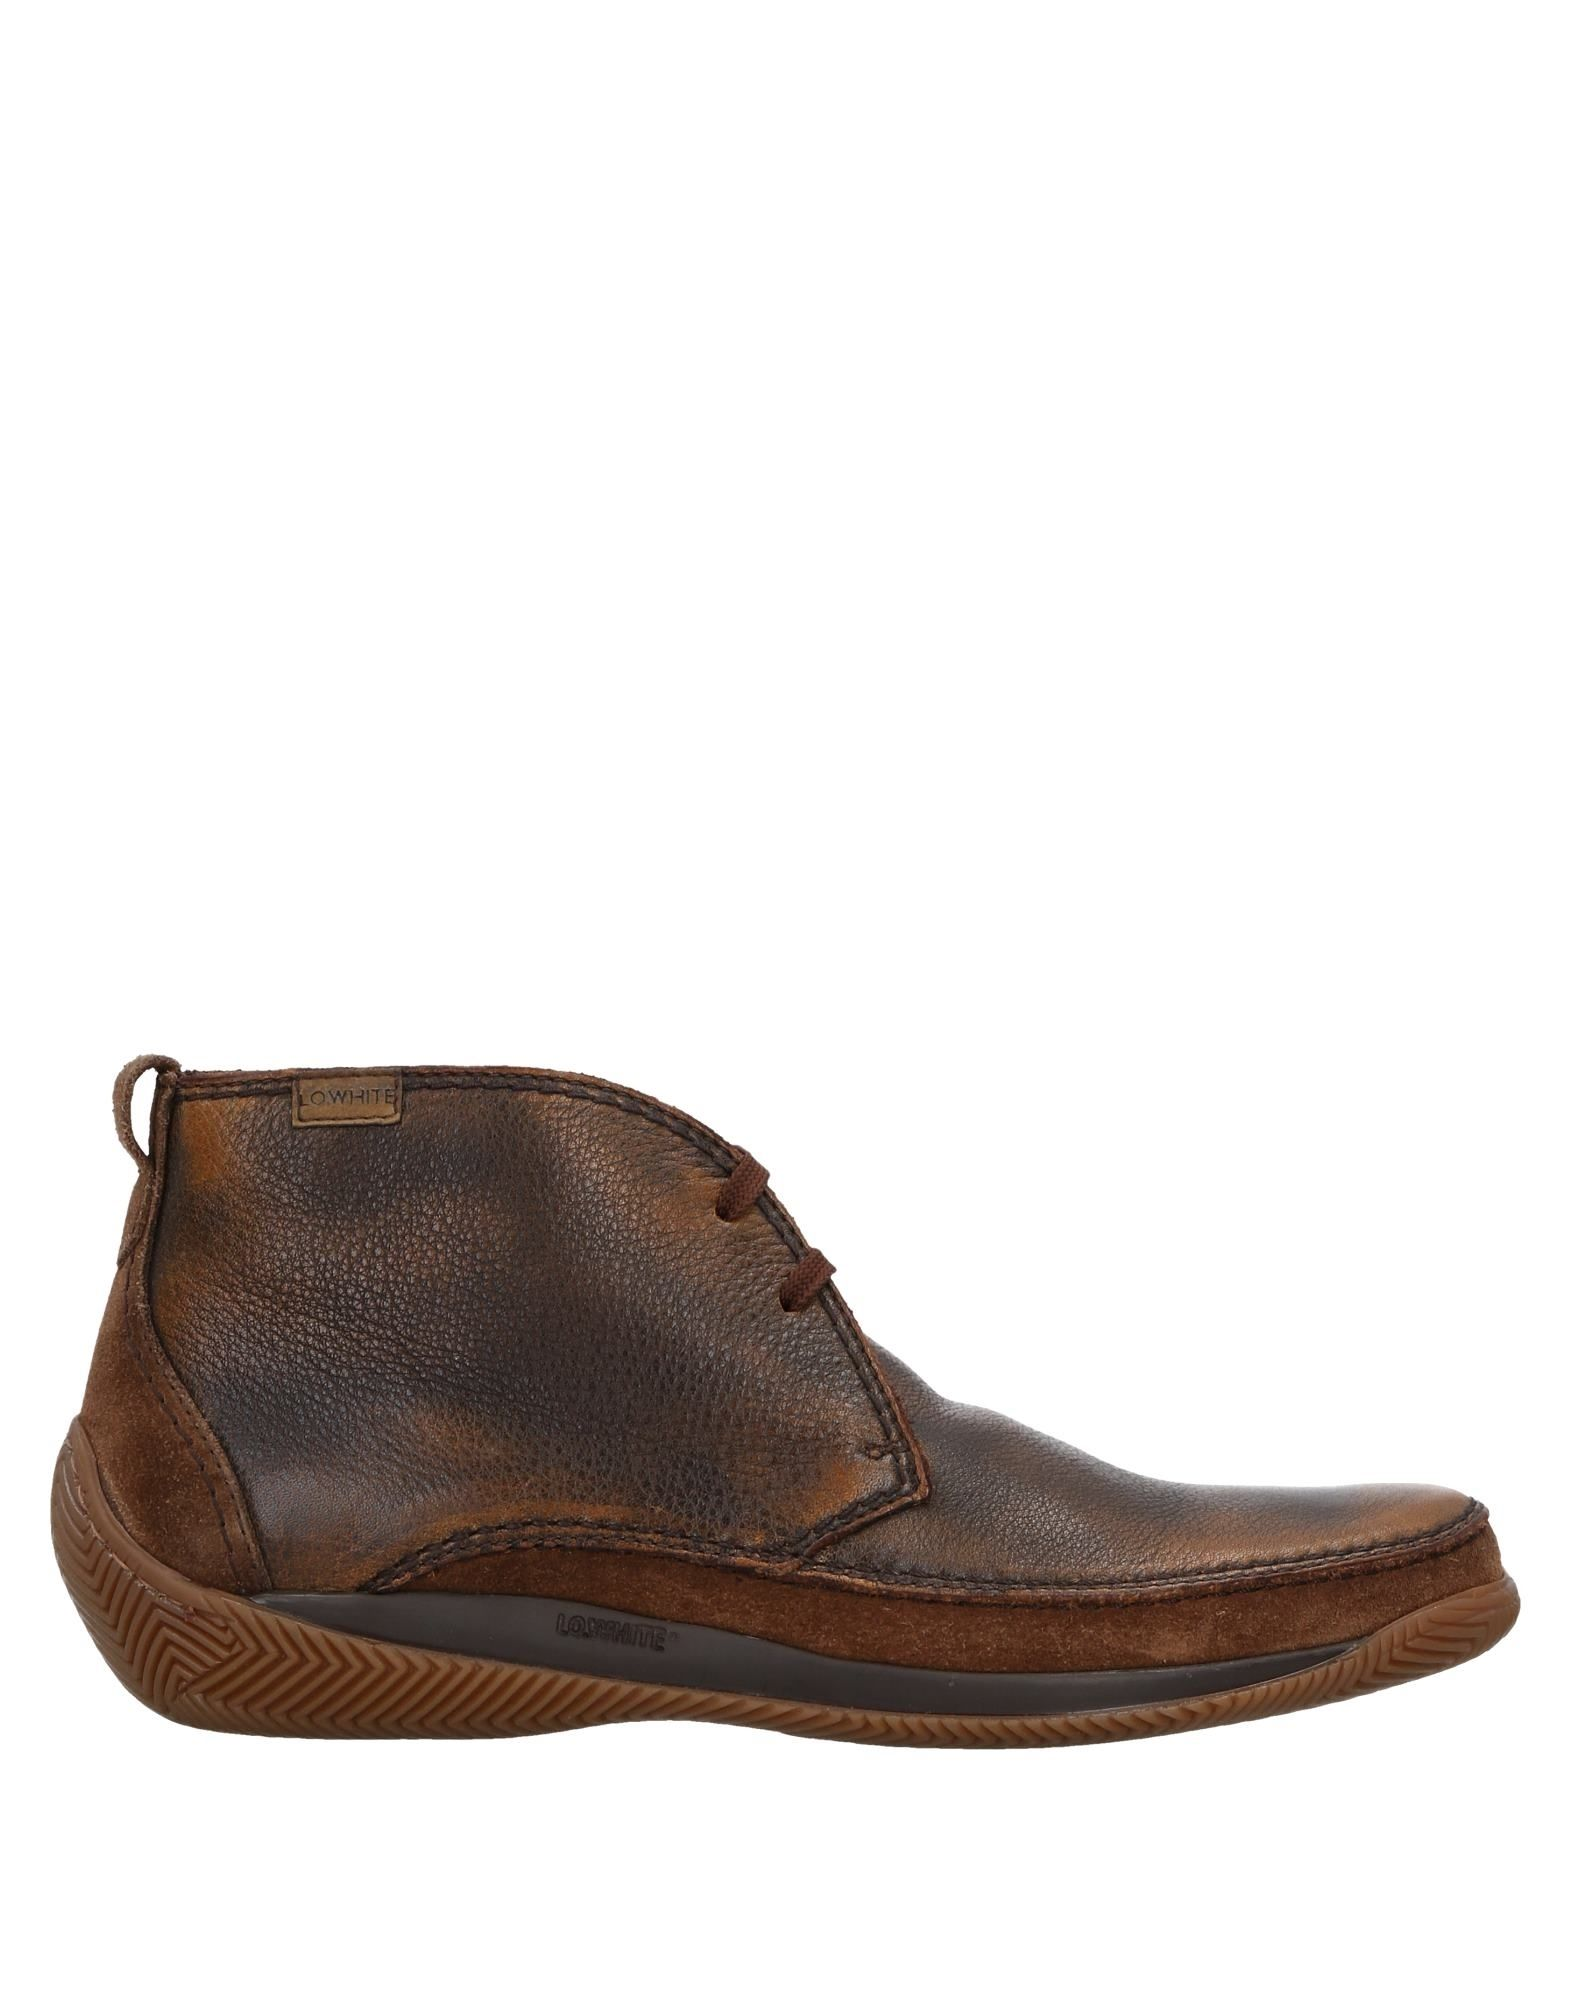 Rabatt echte Schuhe Herren Lo.White Stiefelette Herren Schuhe  11535291LF b758c8